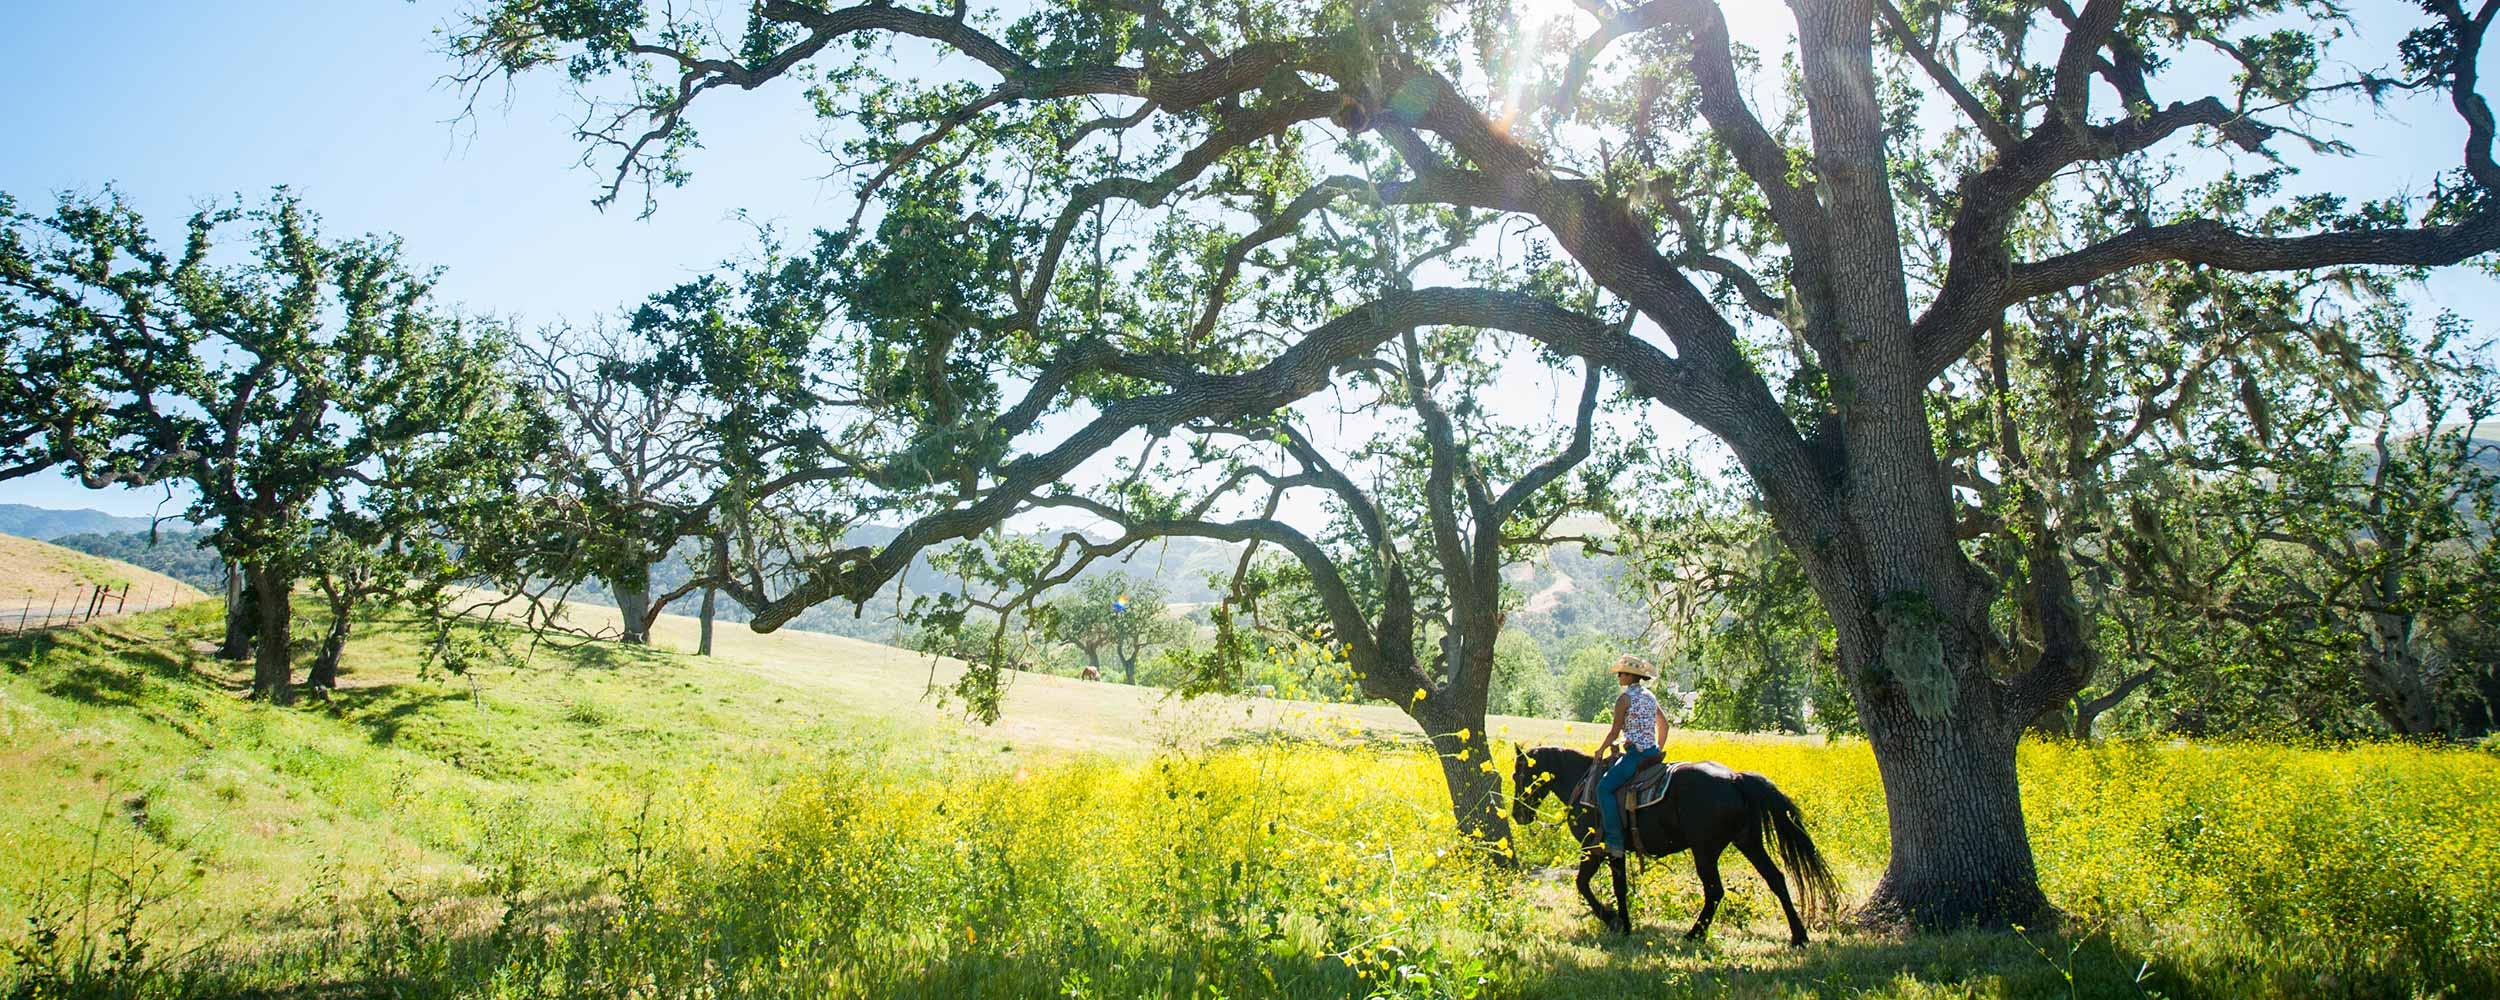 horseback riding under Alisal oaks - Alisal Resort in Solvang California